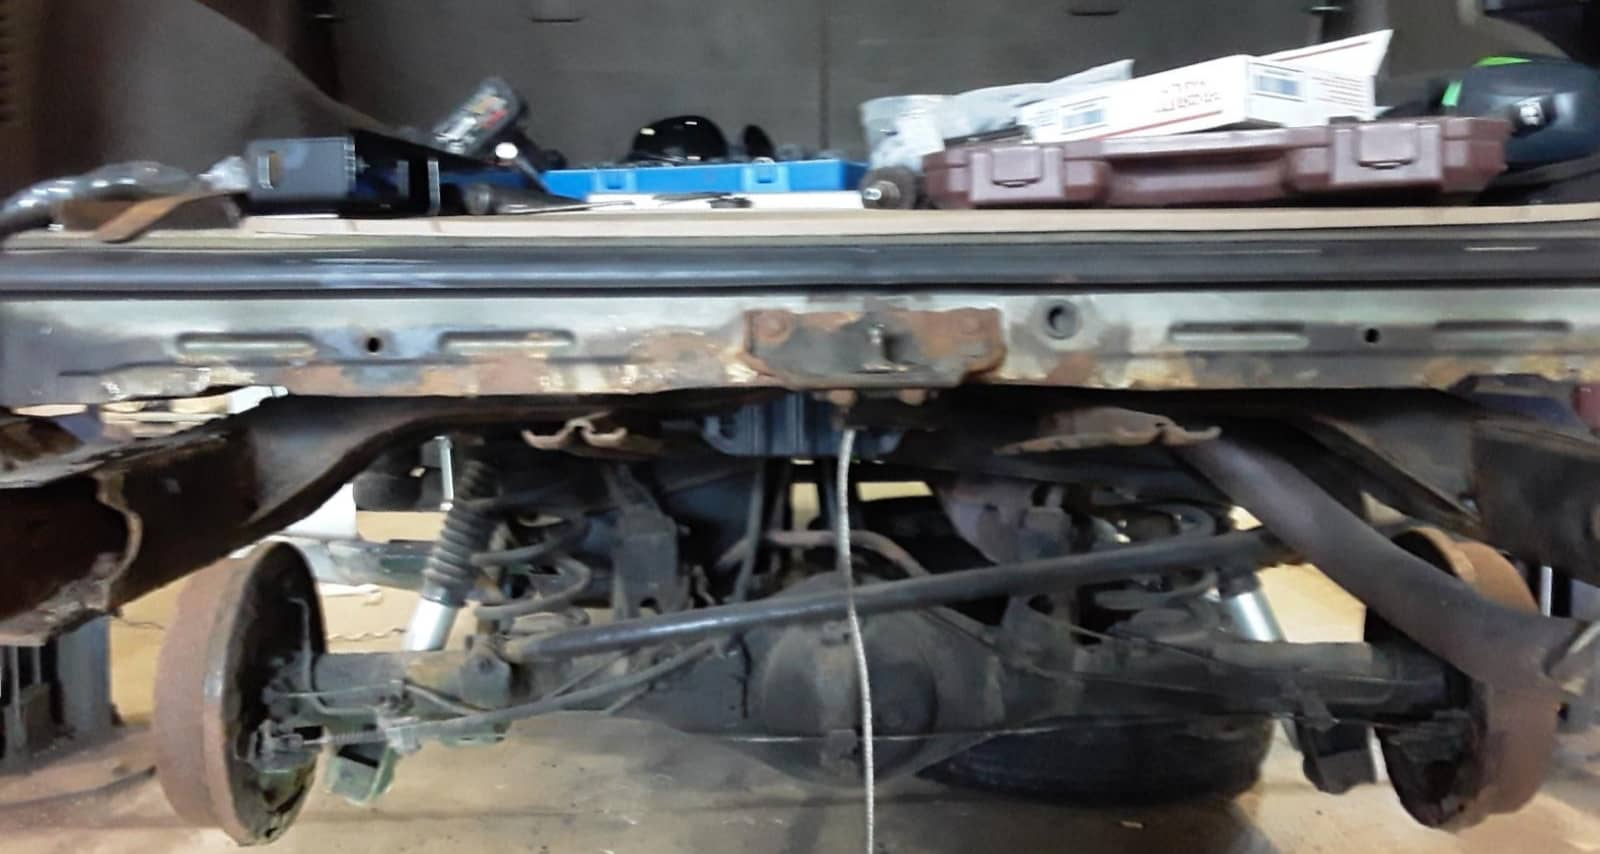 Shrockworks Rear bumper install cost?-webp-net-compress-image-jpg